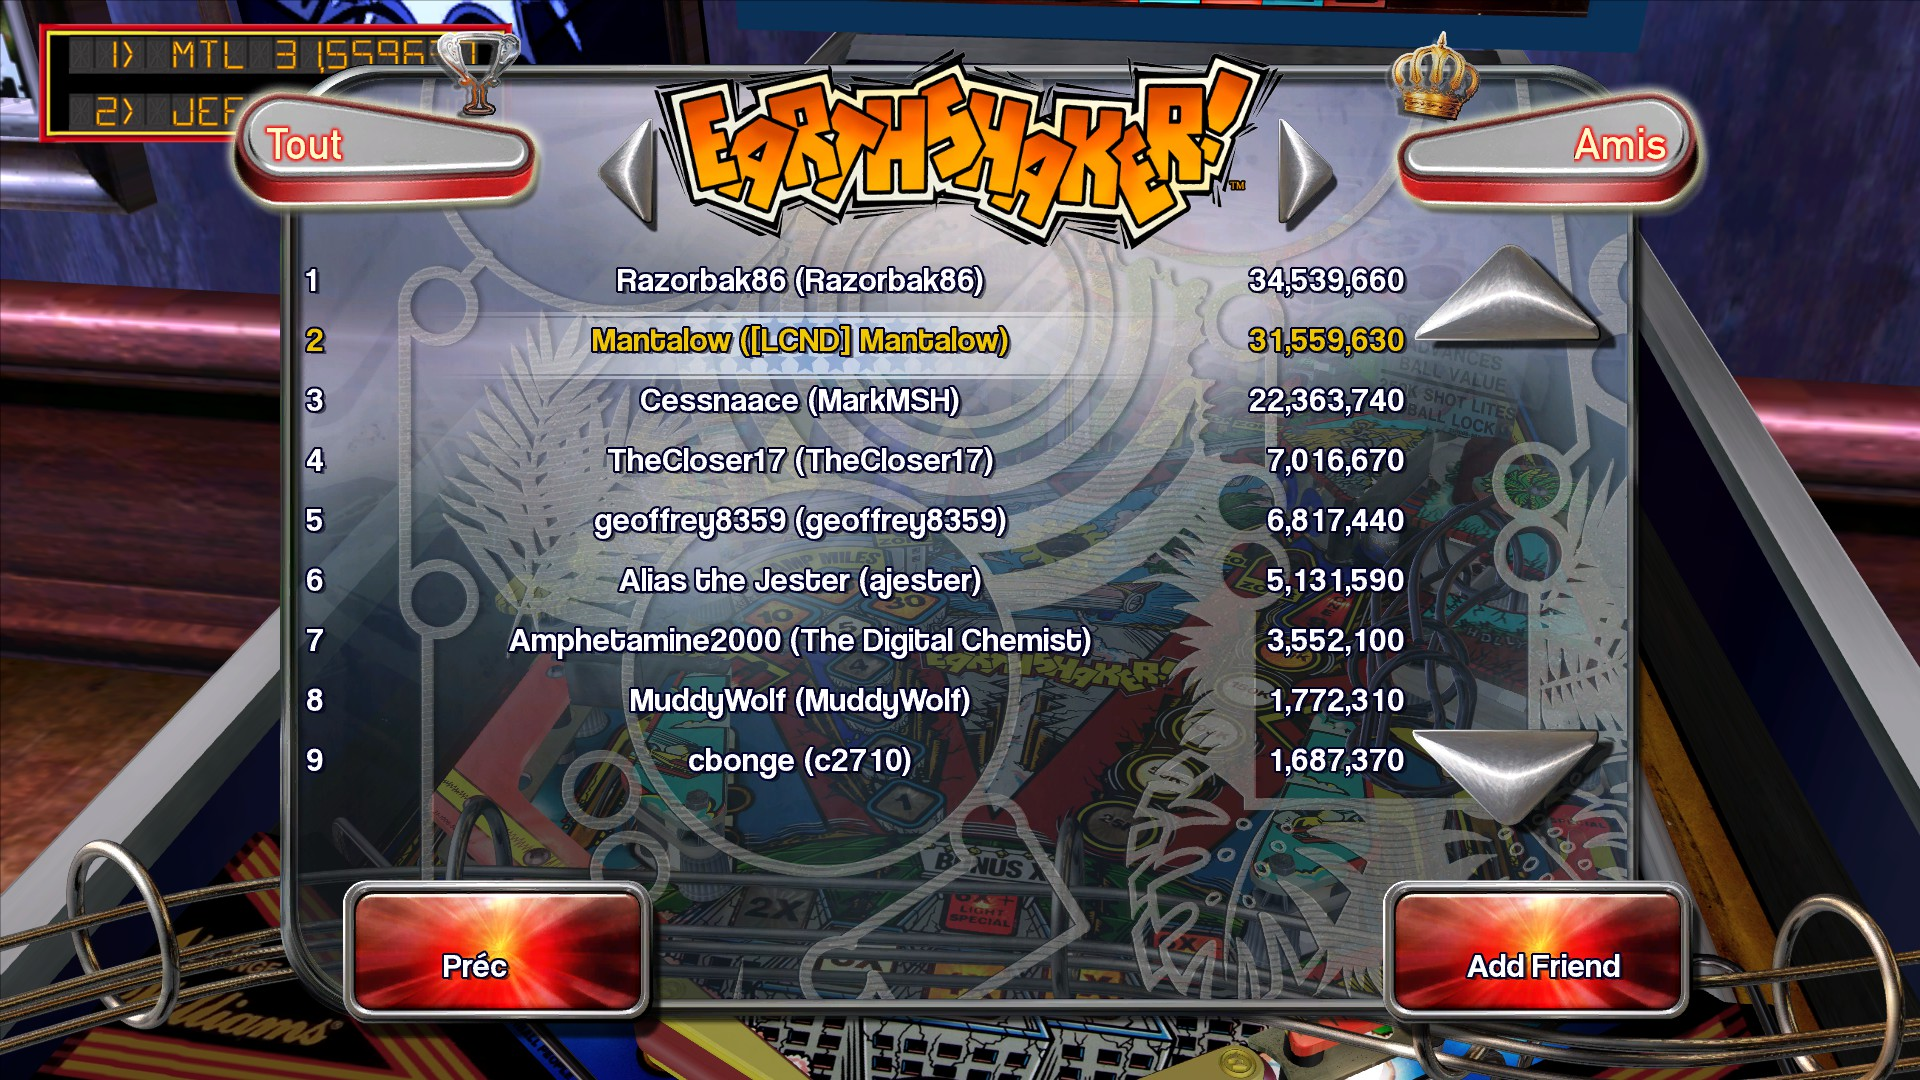 Mantalow: Pinball Arcade: Earthshaker (PC) 31,559,630 points on 2015-10-01 10:15:13